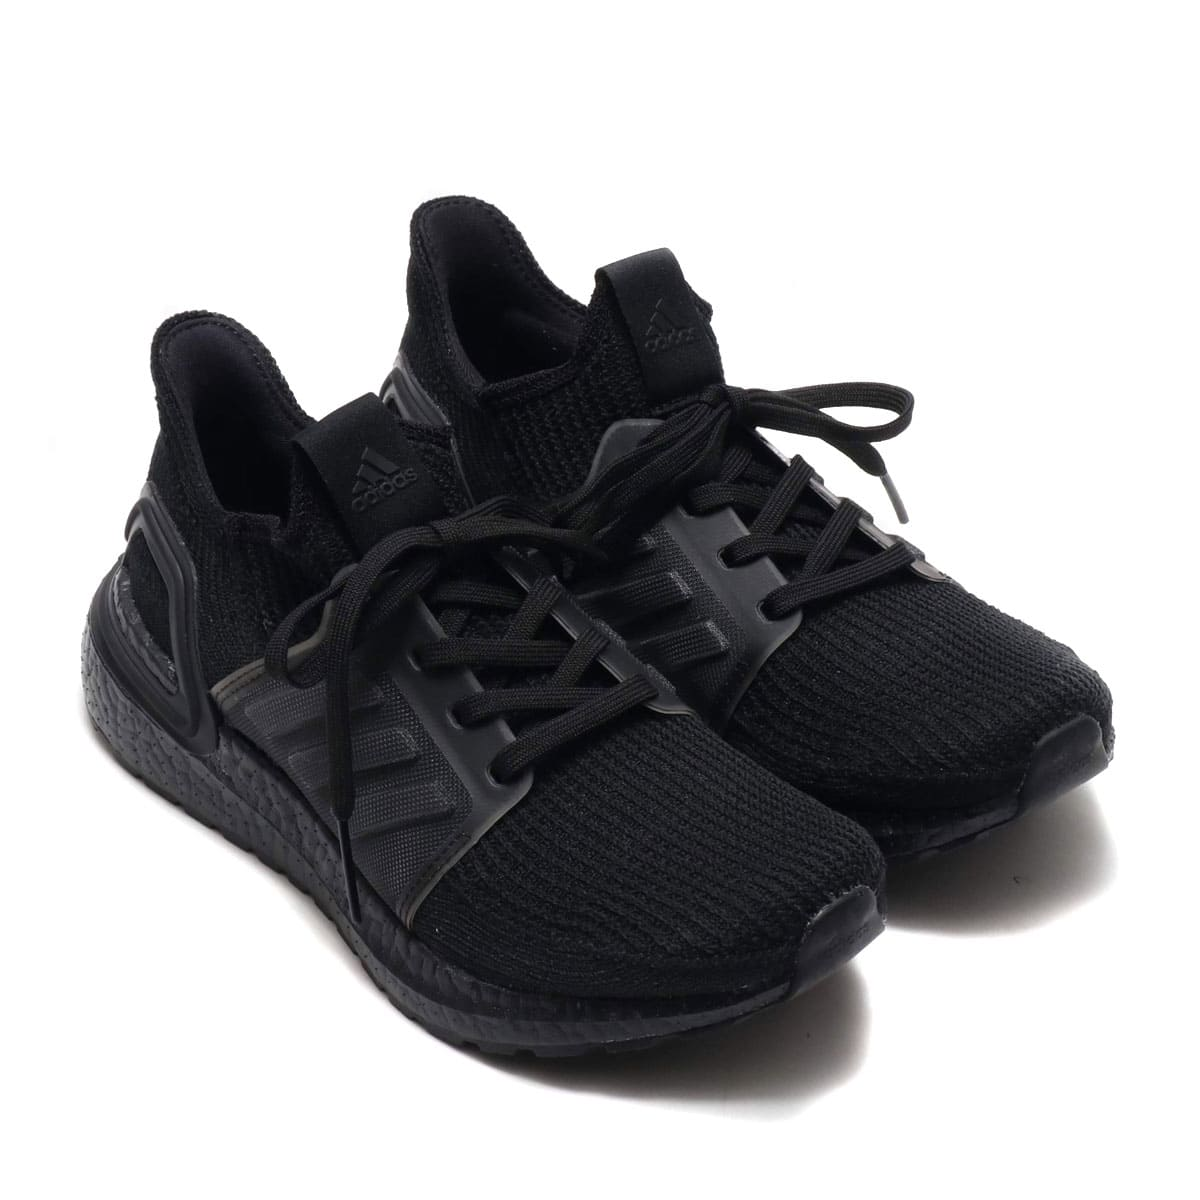 adidas UltraBOOST 19 w CORE BLACK/CORE BLACK/SOLAR ORANGE 19FW-I_photo_large